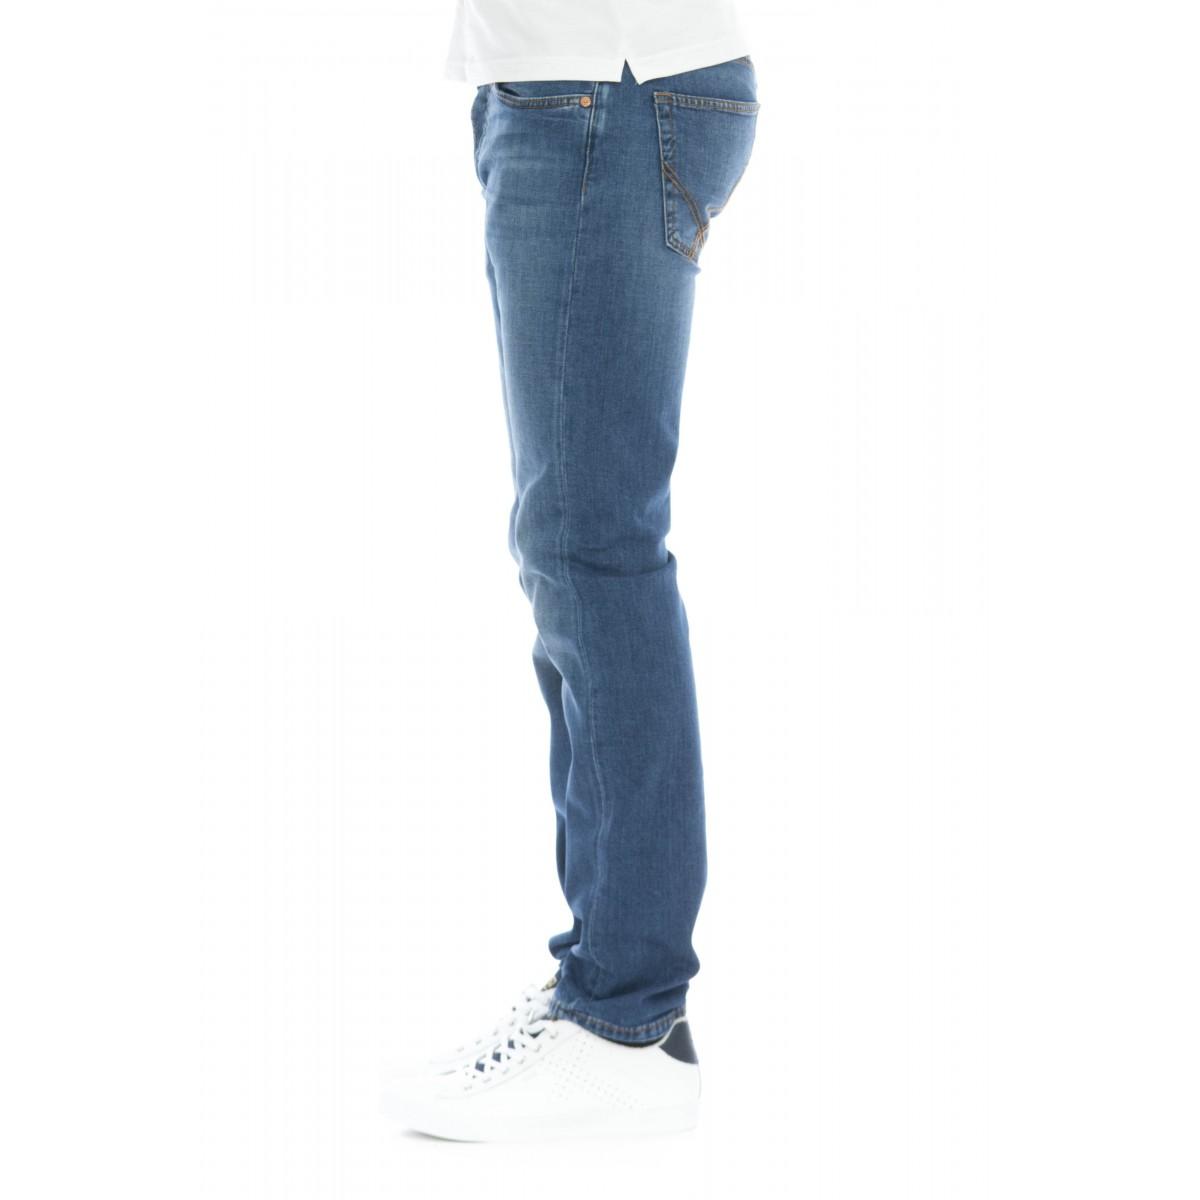 Jeans - 529 nick